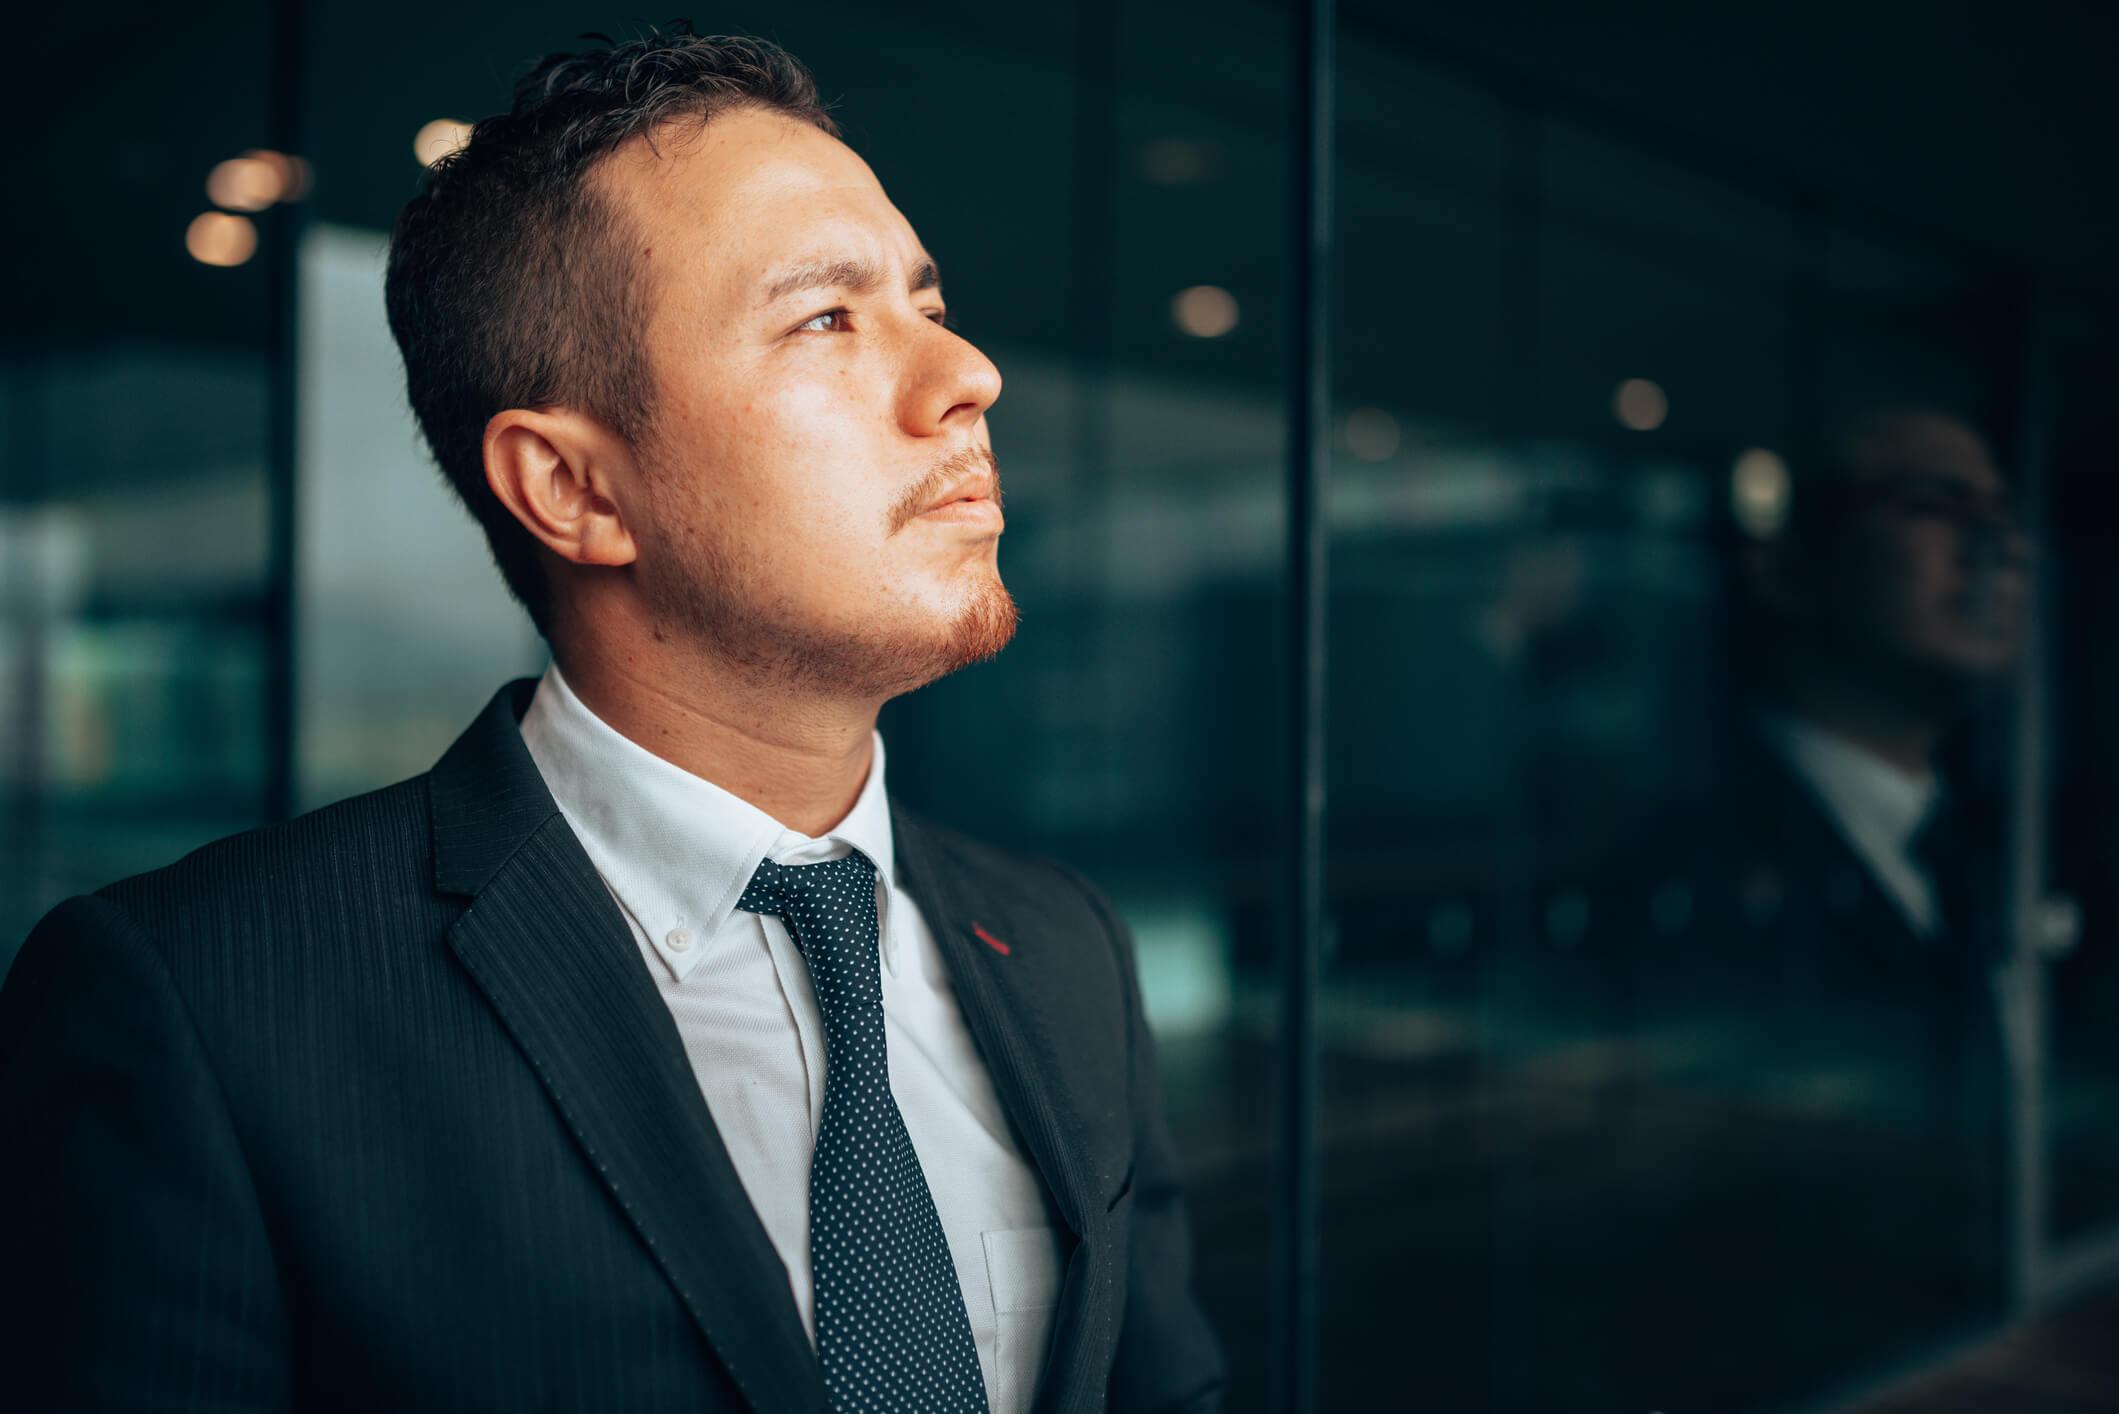 flexibility career planning Japanese companies junansei